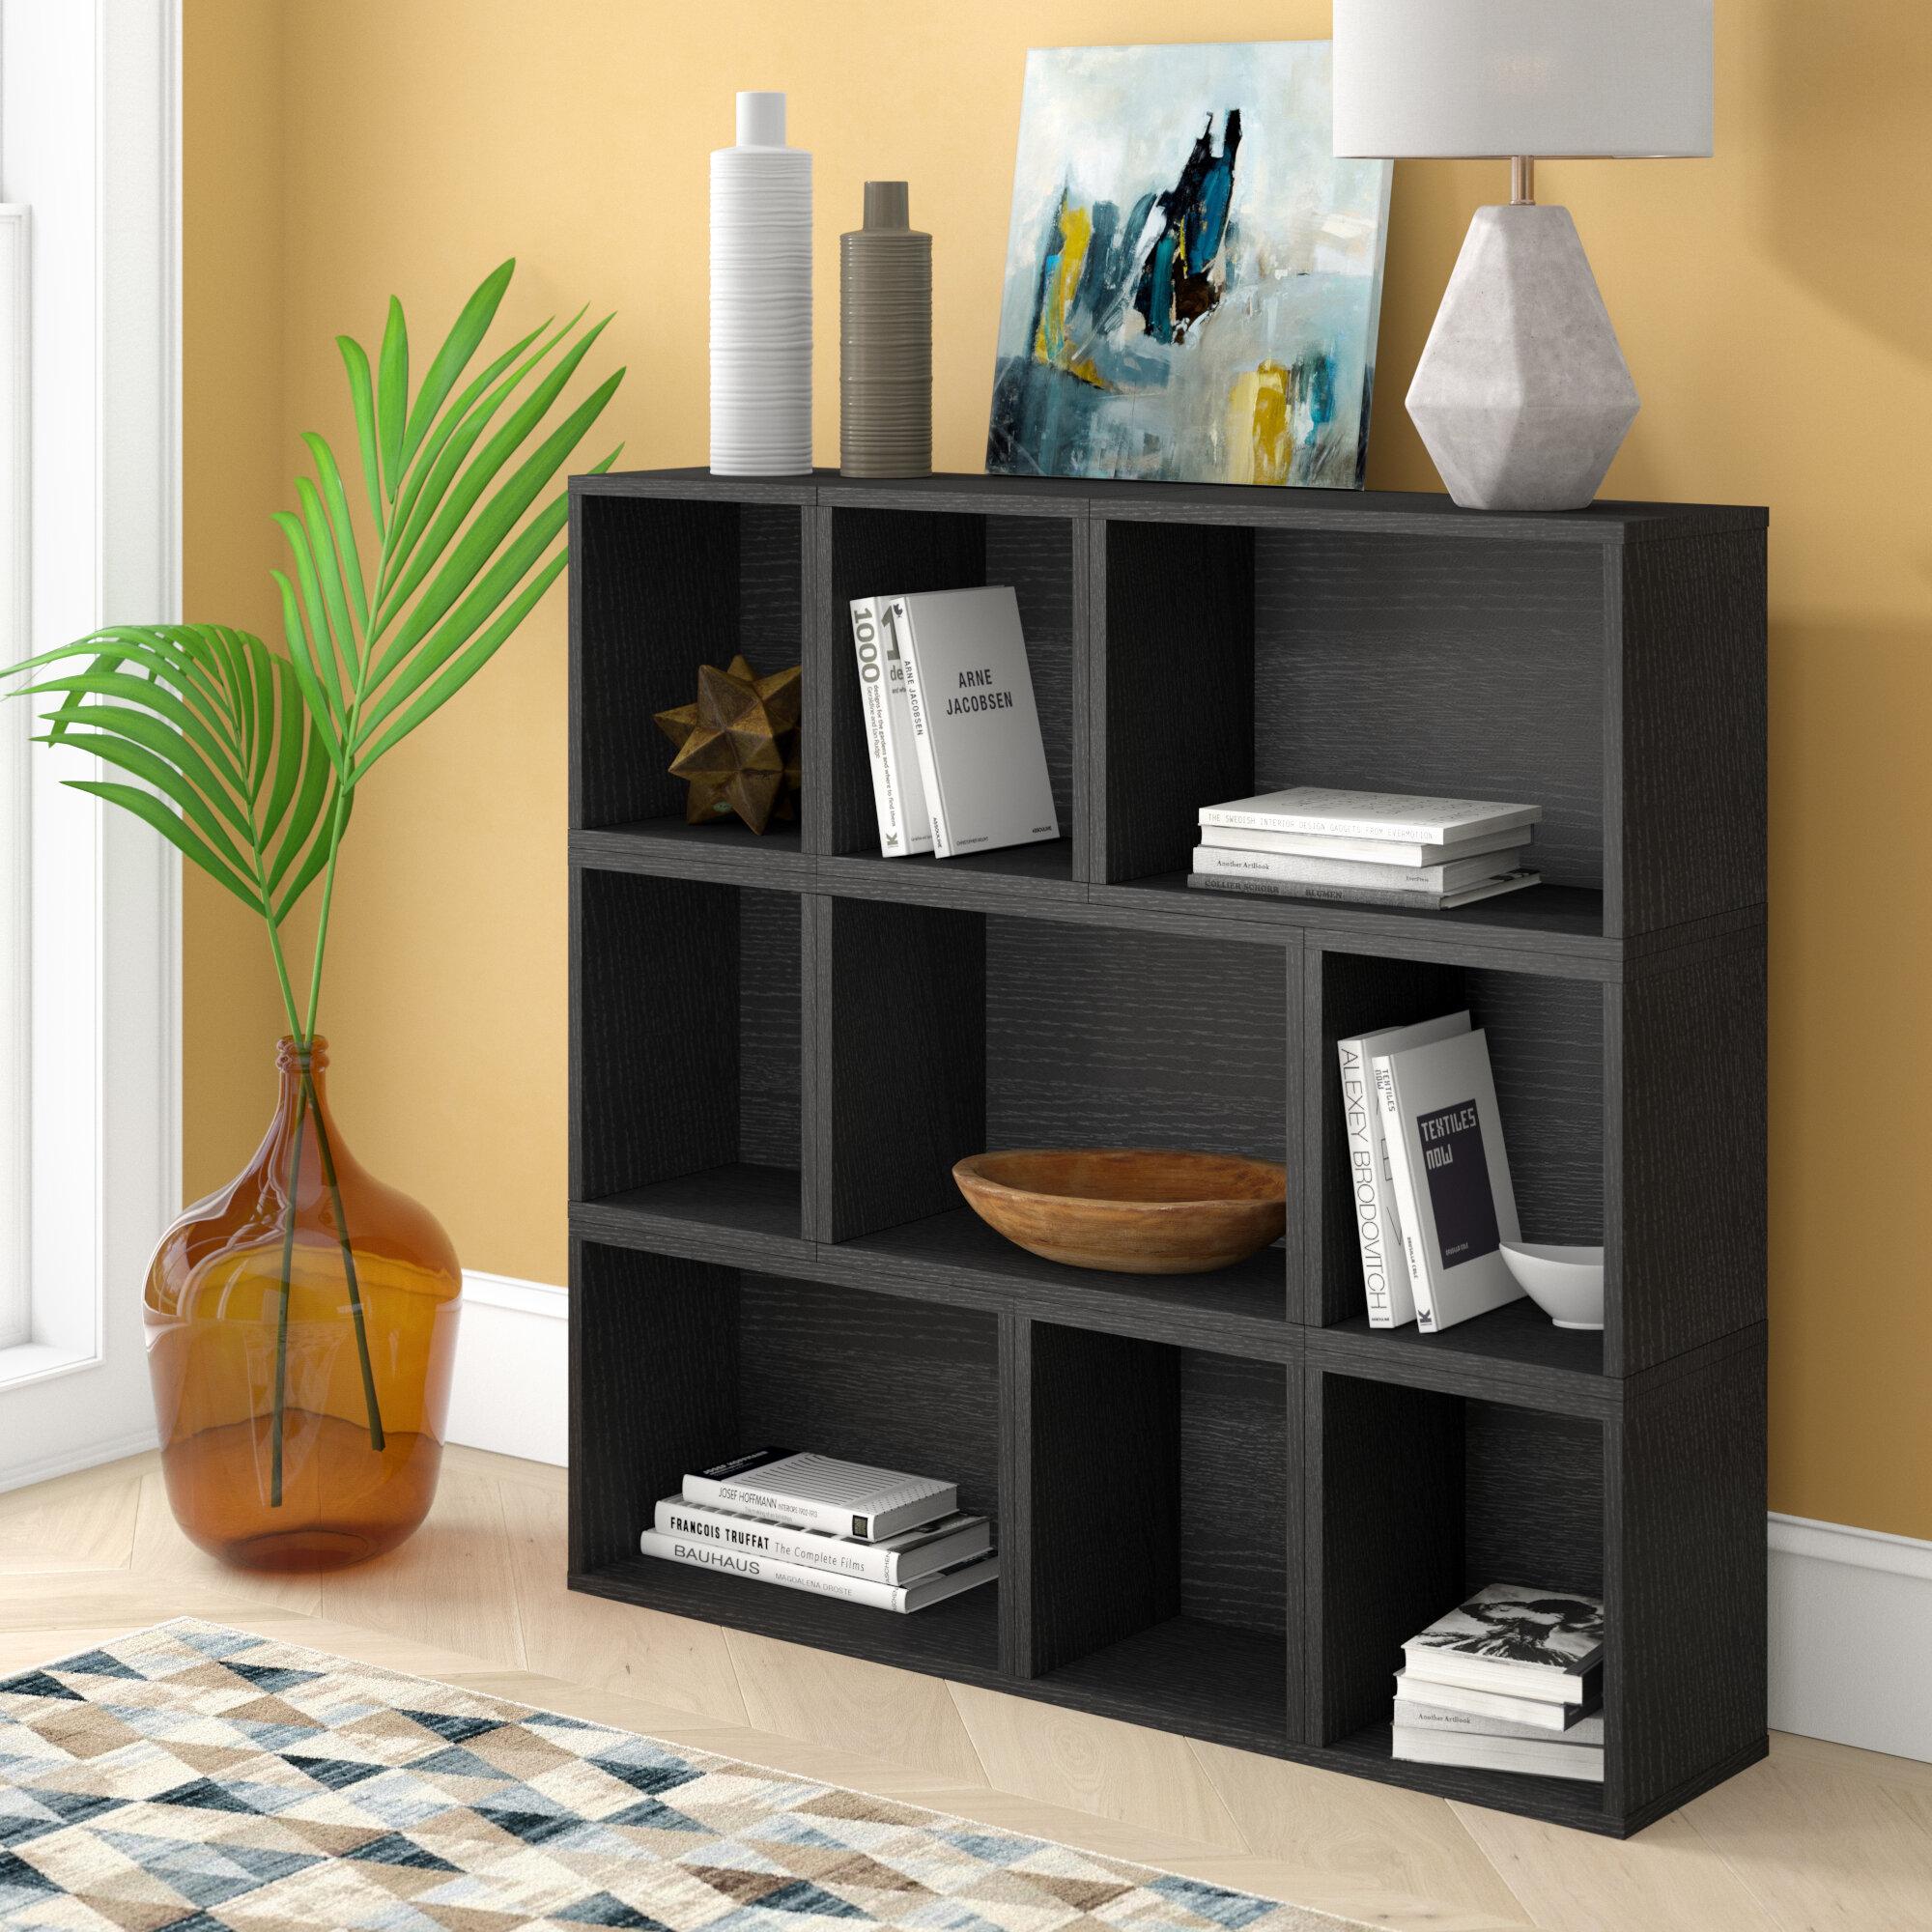 Brayden studio beckmann oxford modular organizer cube unit bookcase reviews wayfair